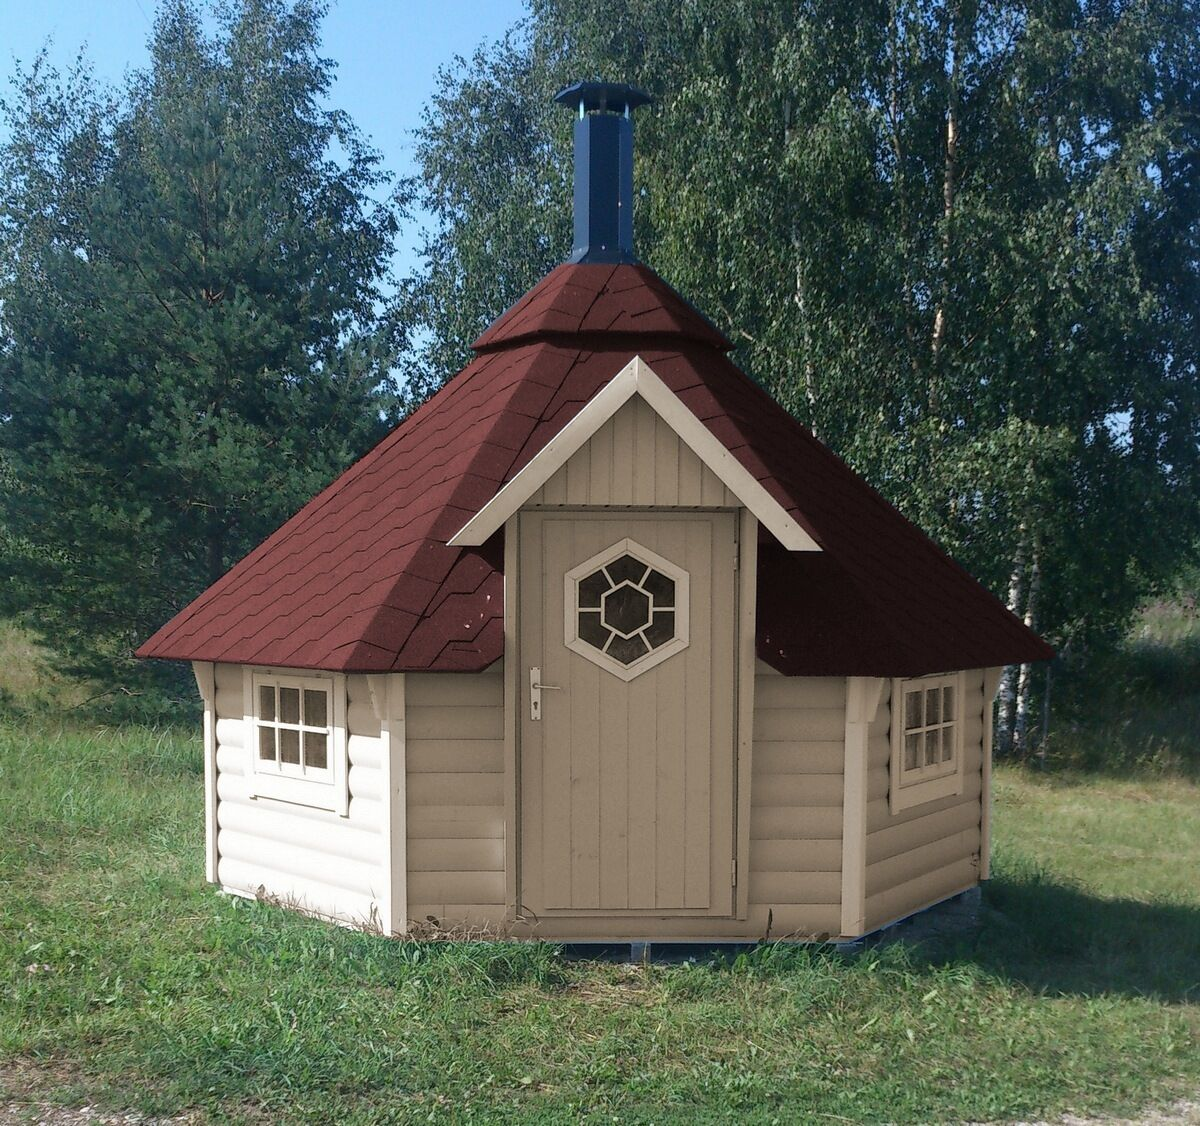 grillkota inkl grillanlage pavillon gartenhaus grillh tte. Black Bedroom Furniture Sets. Home Design Ideas